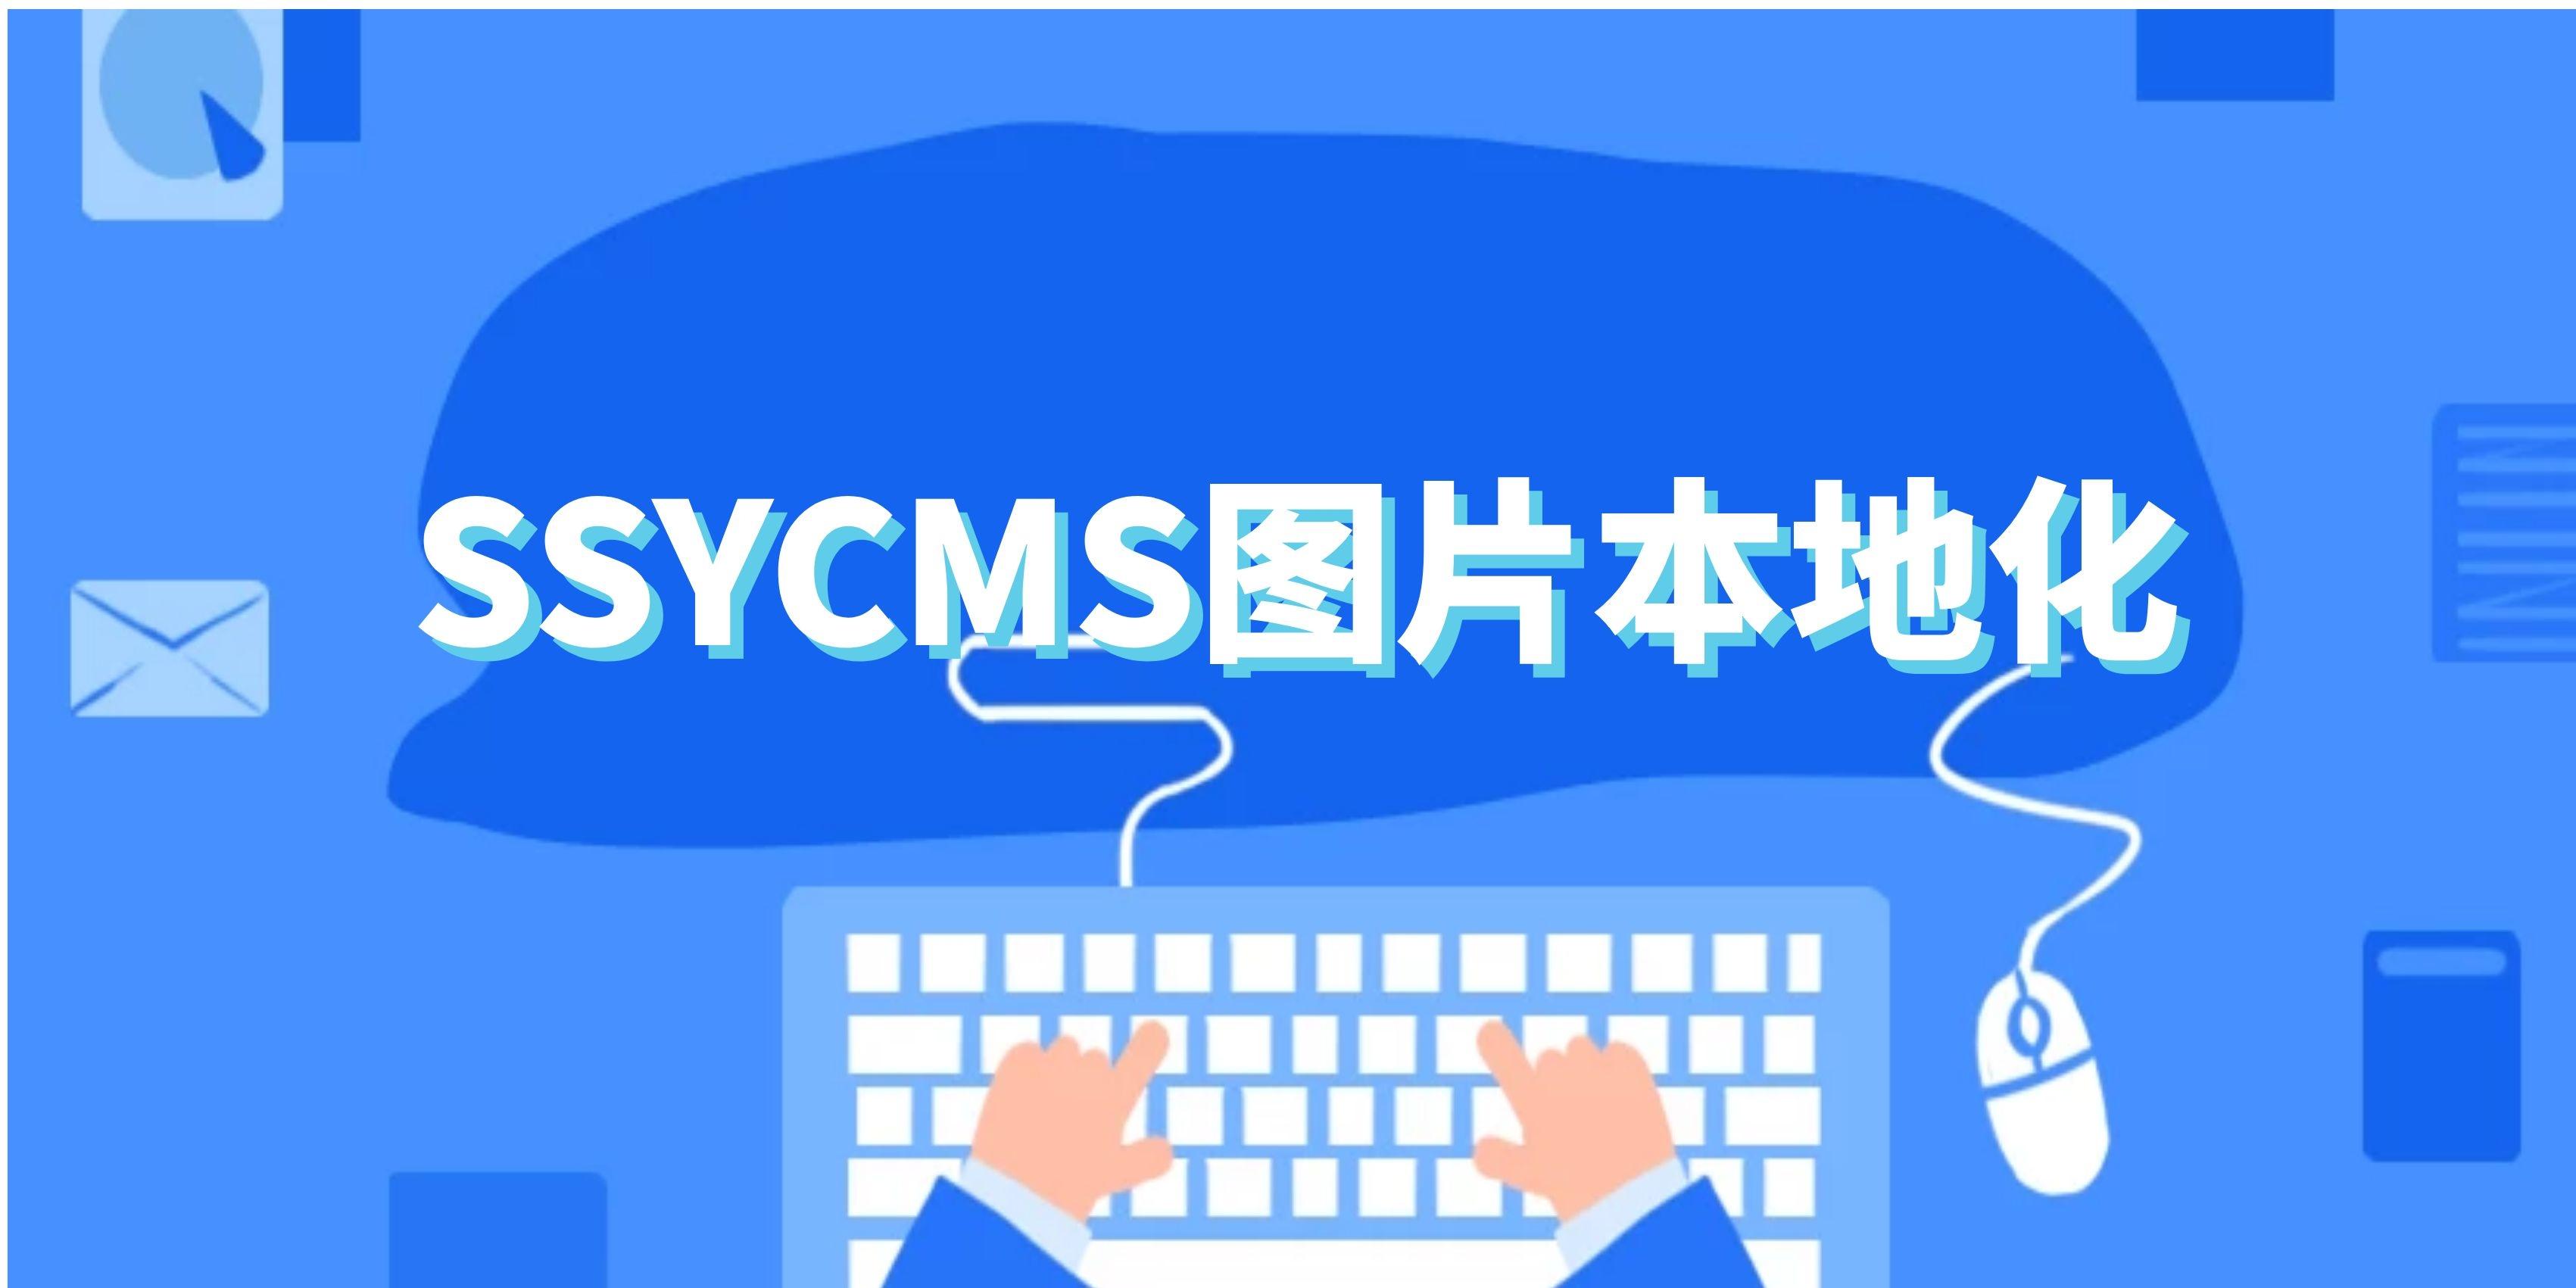 SSYCMS文章发布图片本地化